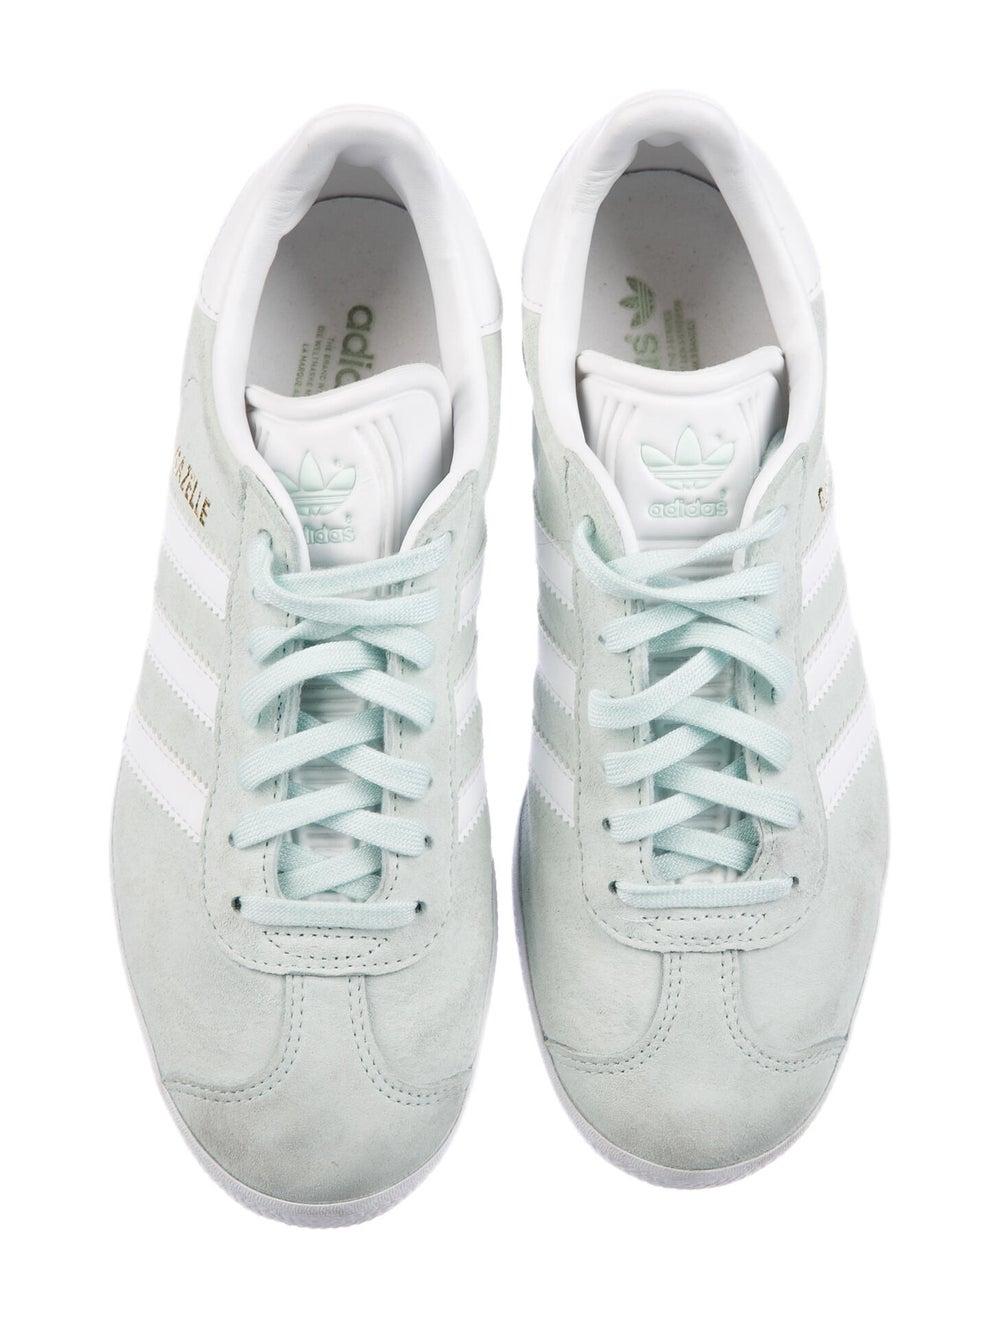 Adidas Gazelle Sneakers Green - image 3